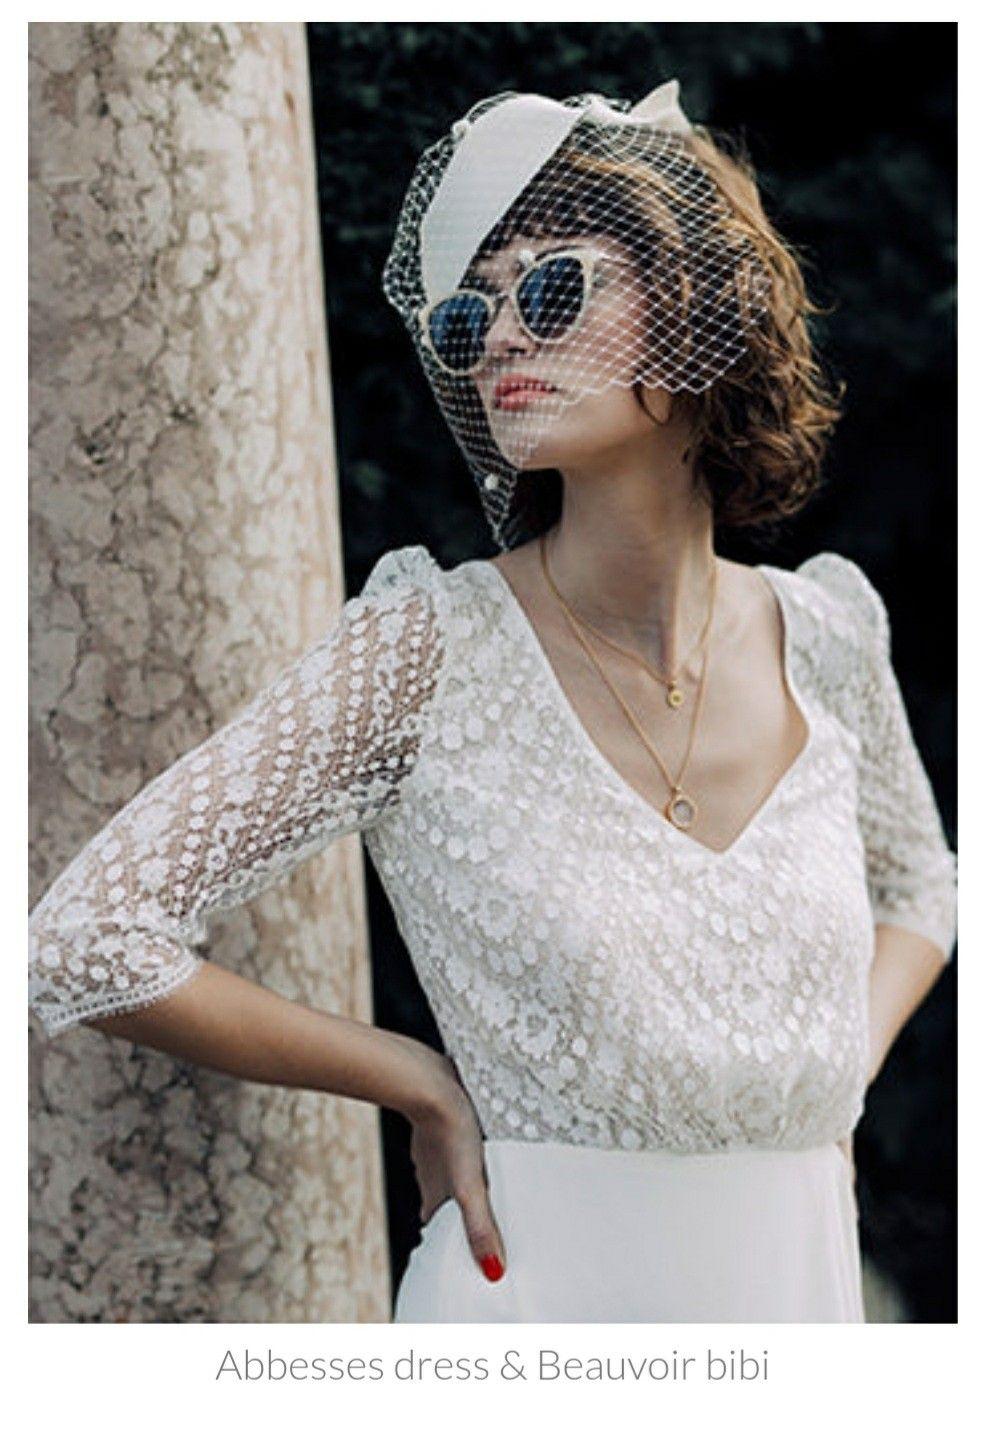 Laure De Sagazan In 2021 Retro Bridal Bridal Designs Wedding Dresses [ 1432 x 985 Pixel ]